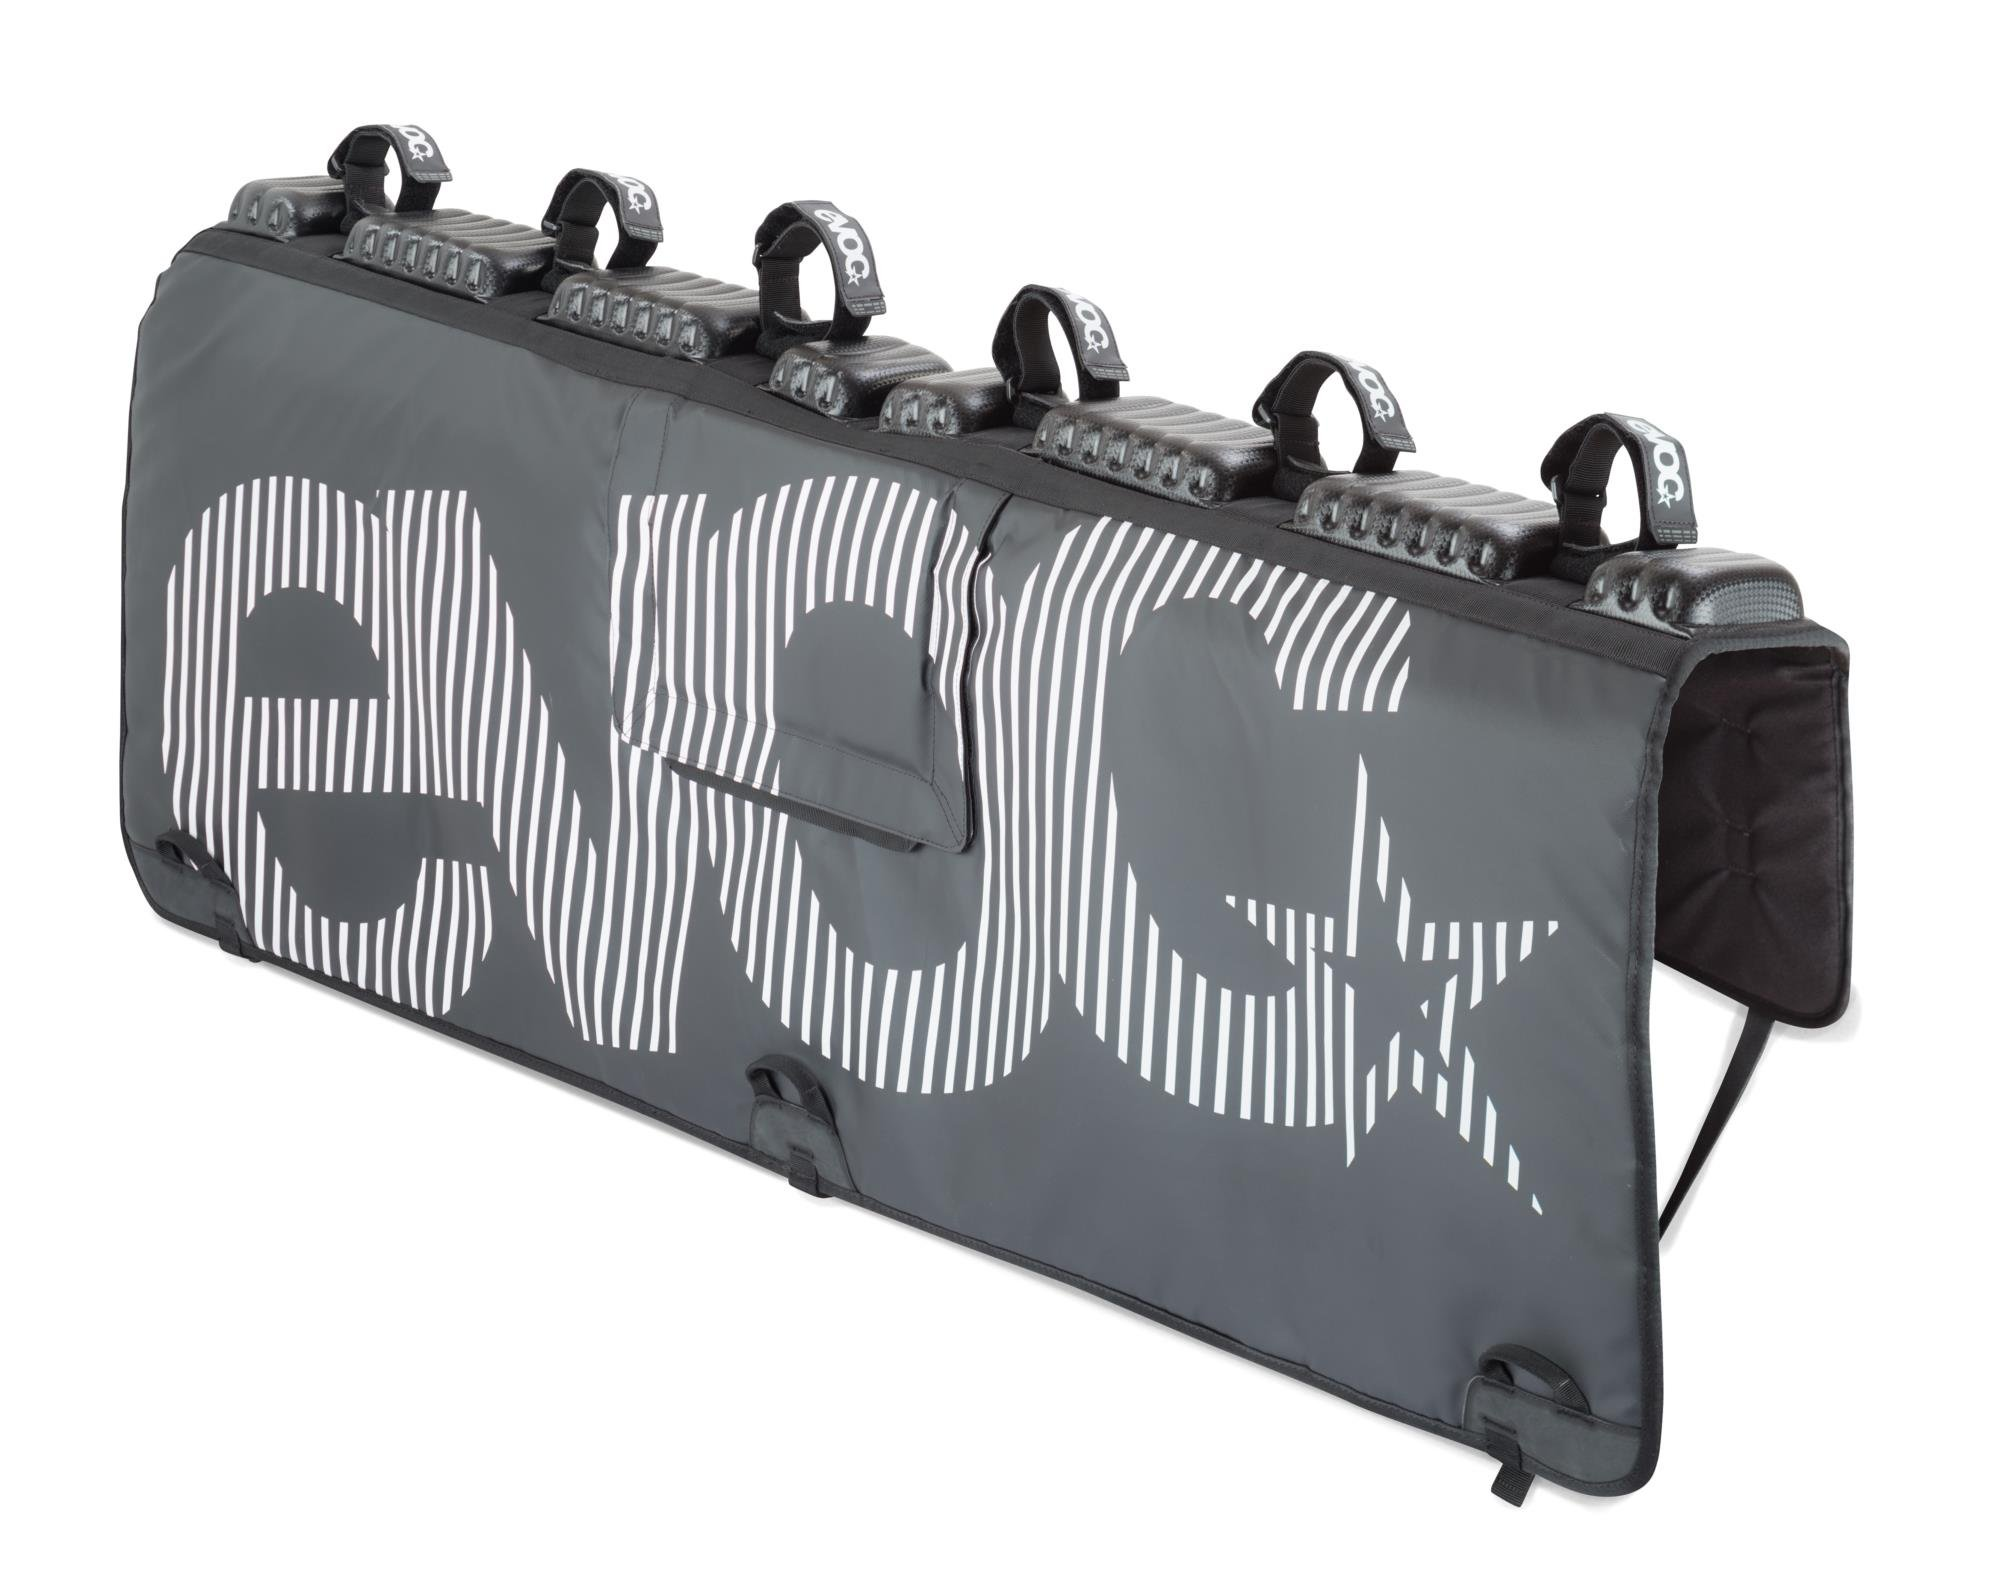 Evoc Tailgate Pad Black, XL by Evoc